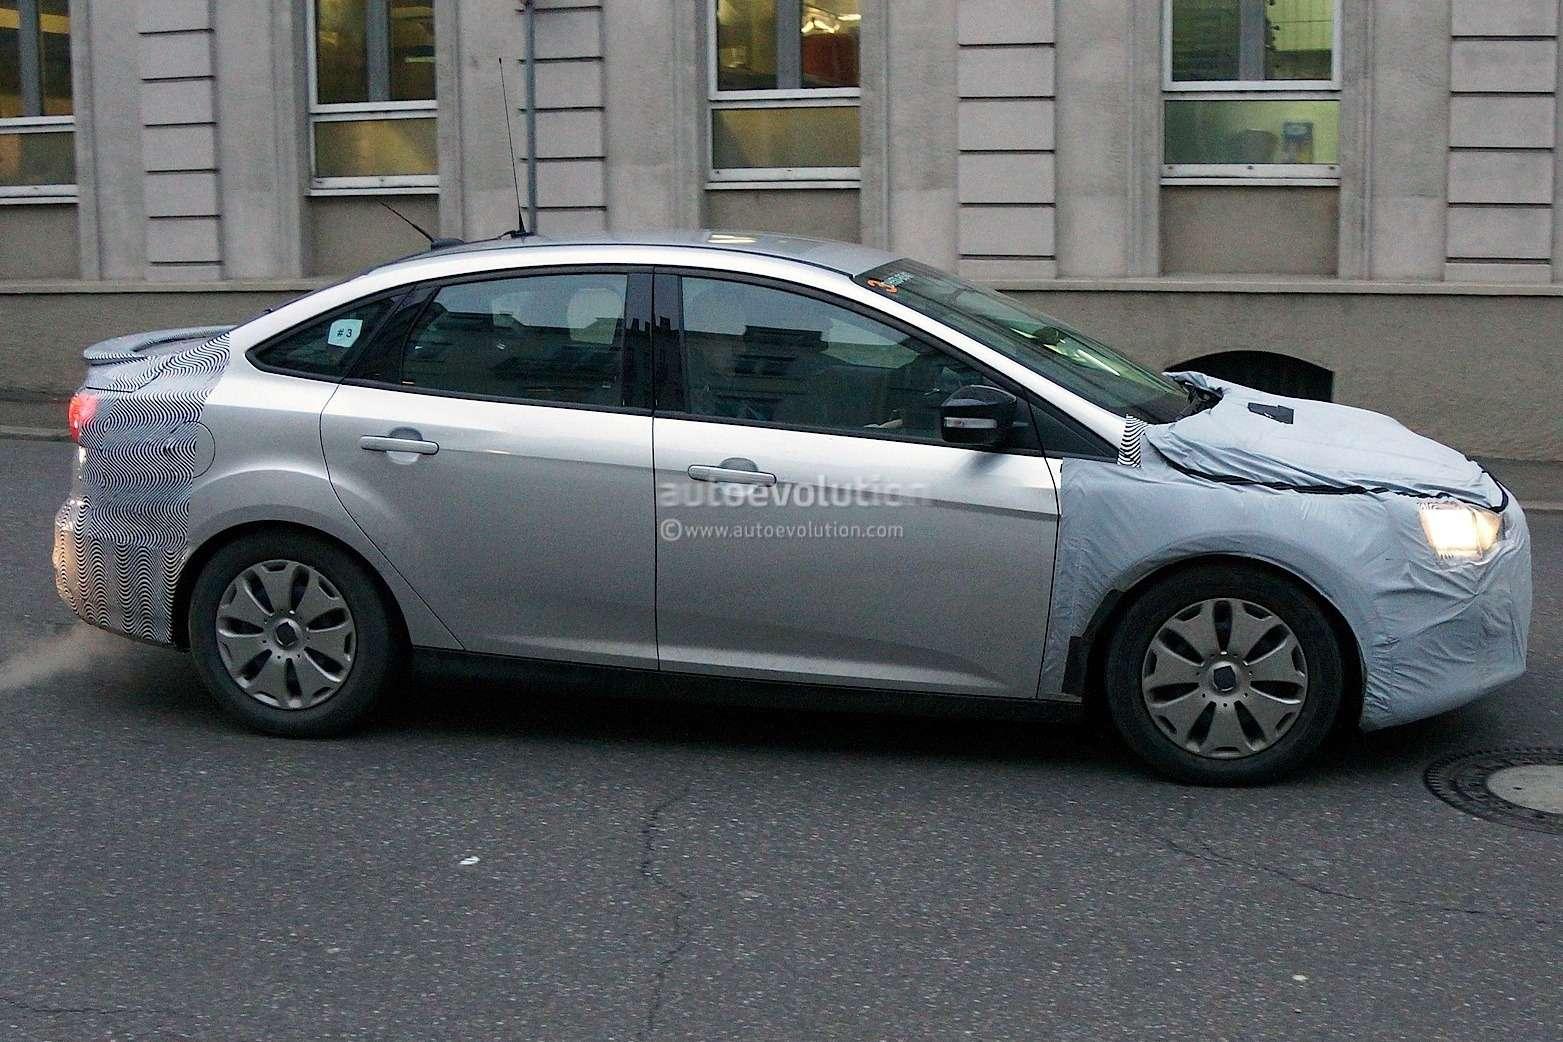 spyshots-2015-ford-focus-hatchback-sedan-and-estate-1080p-9_no_copyright